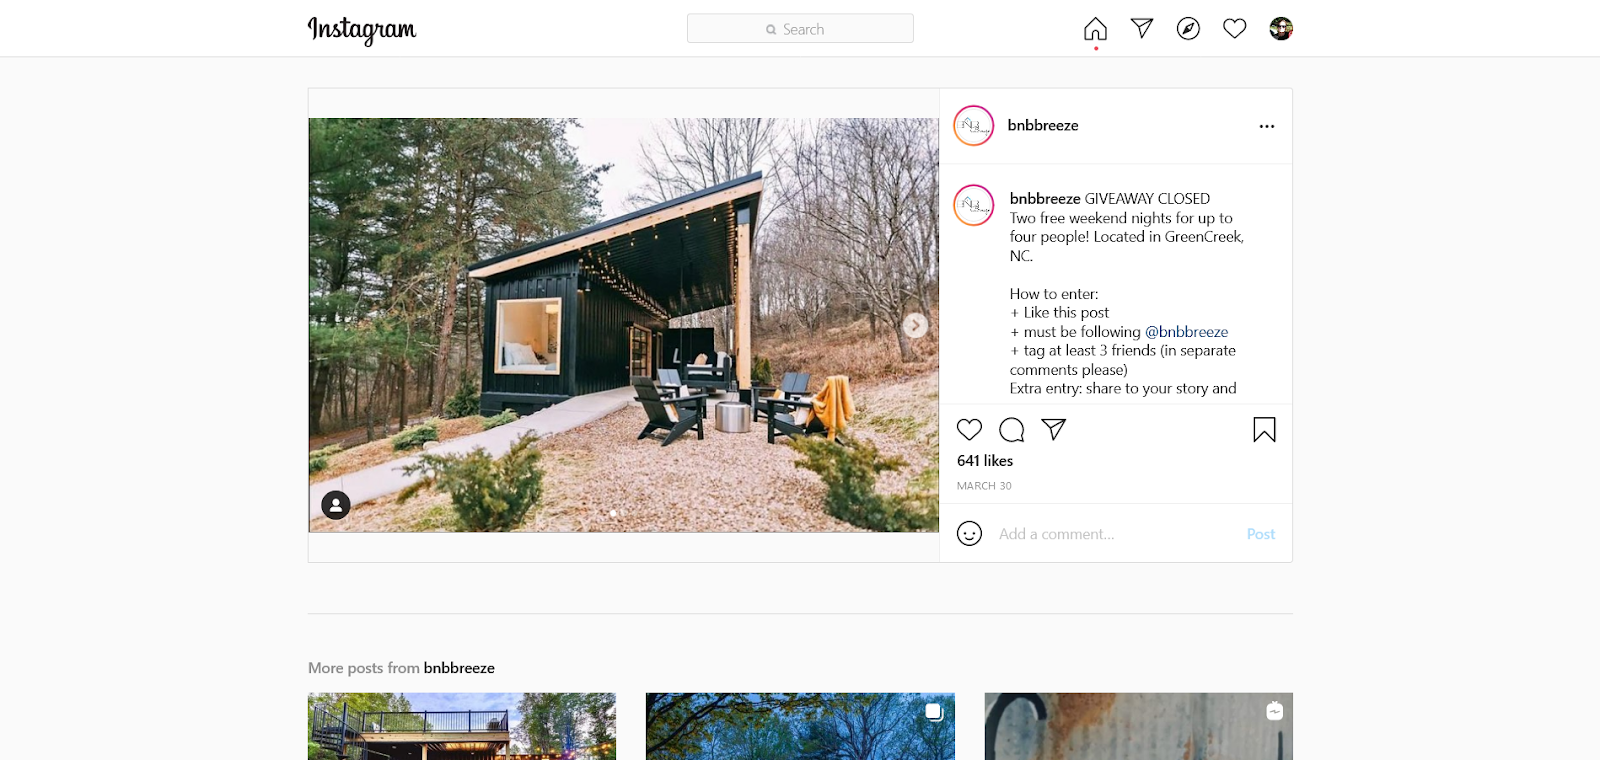 bnbbreeze instagram giveaway